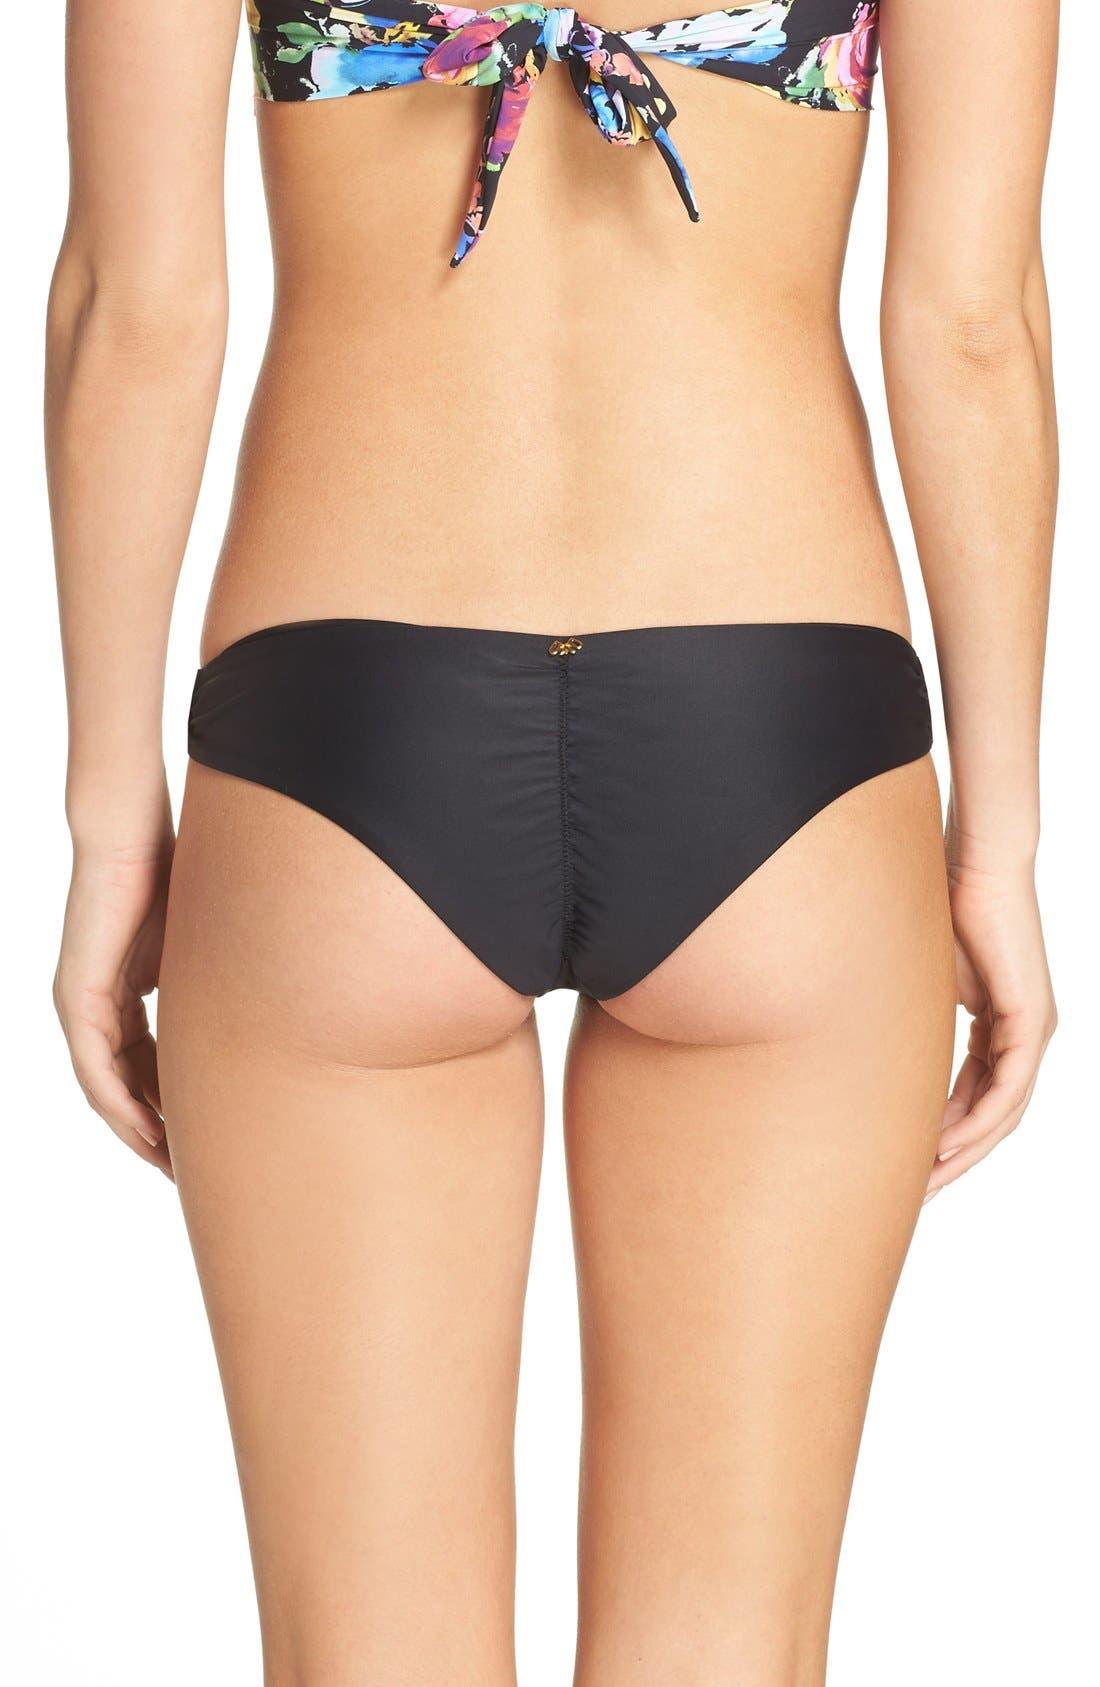 Alternate Image 1 Selected - PilyQ Bikini Bottoms